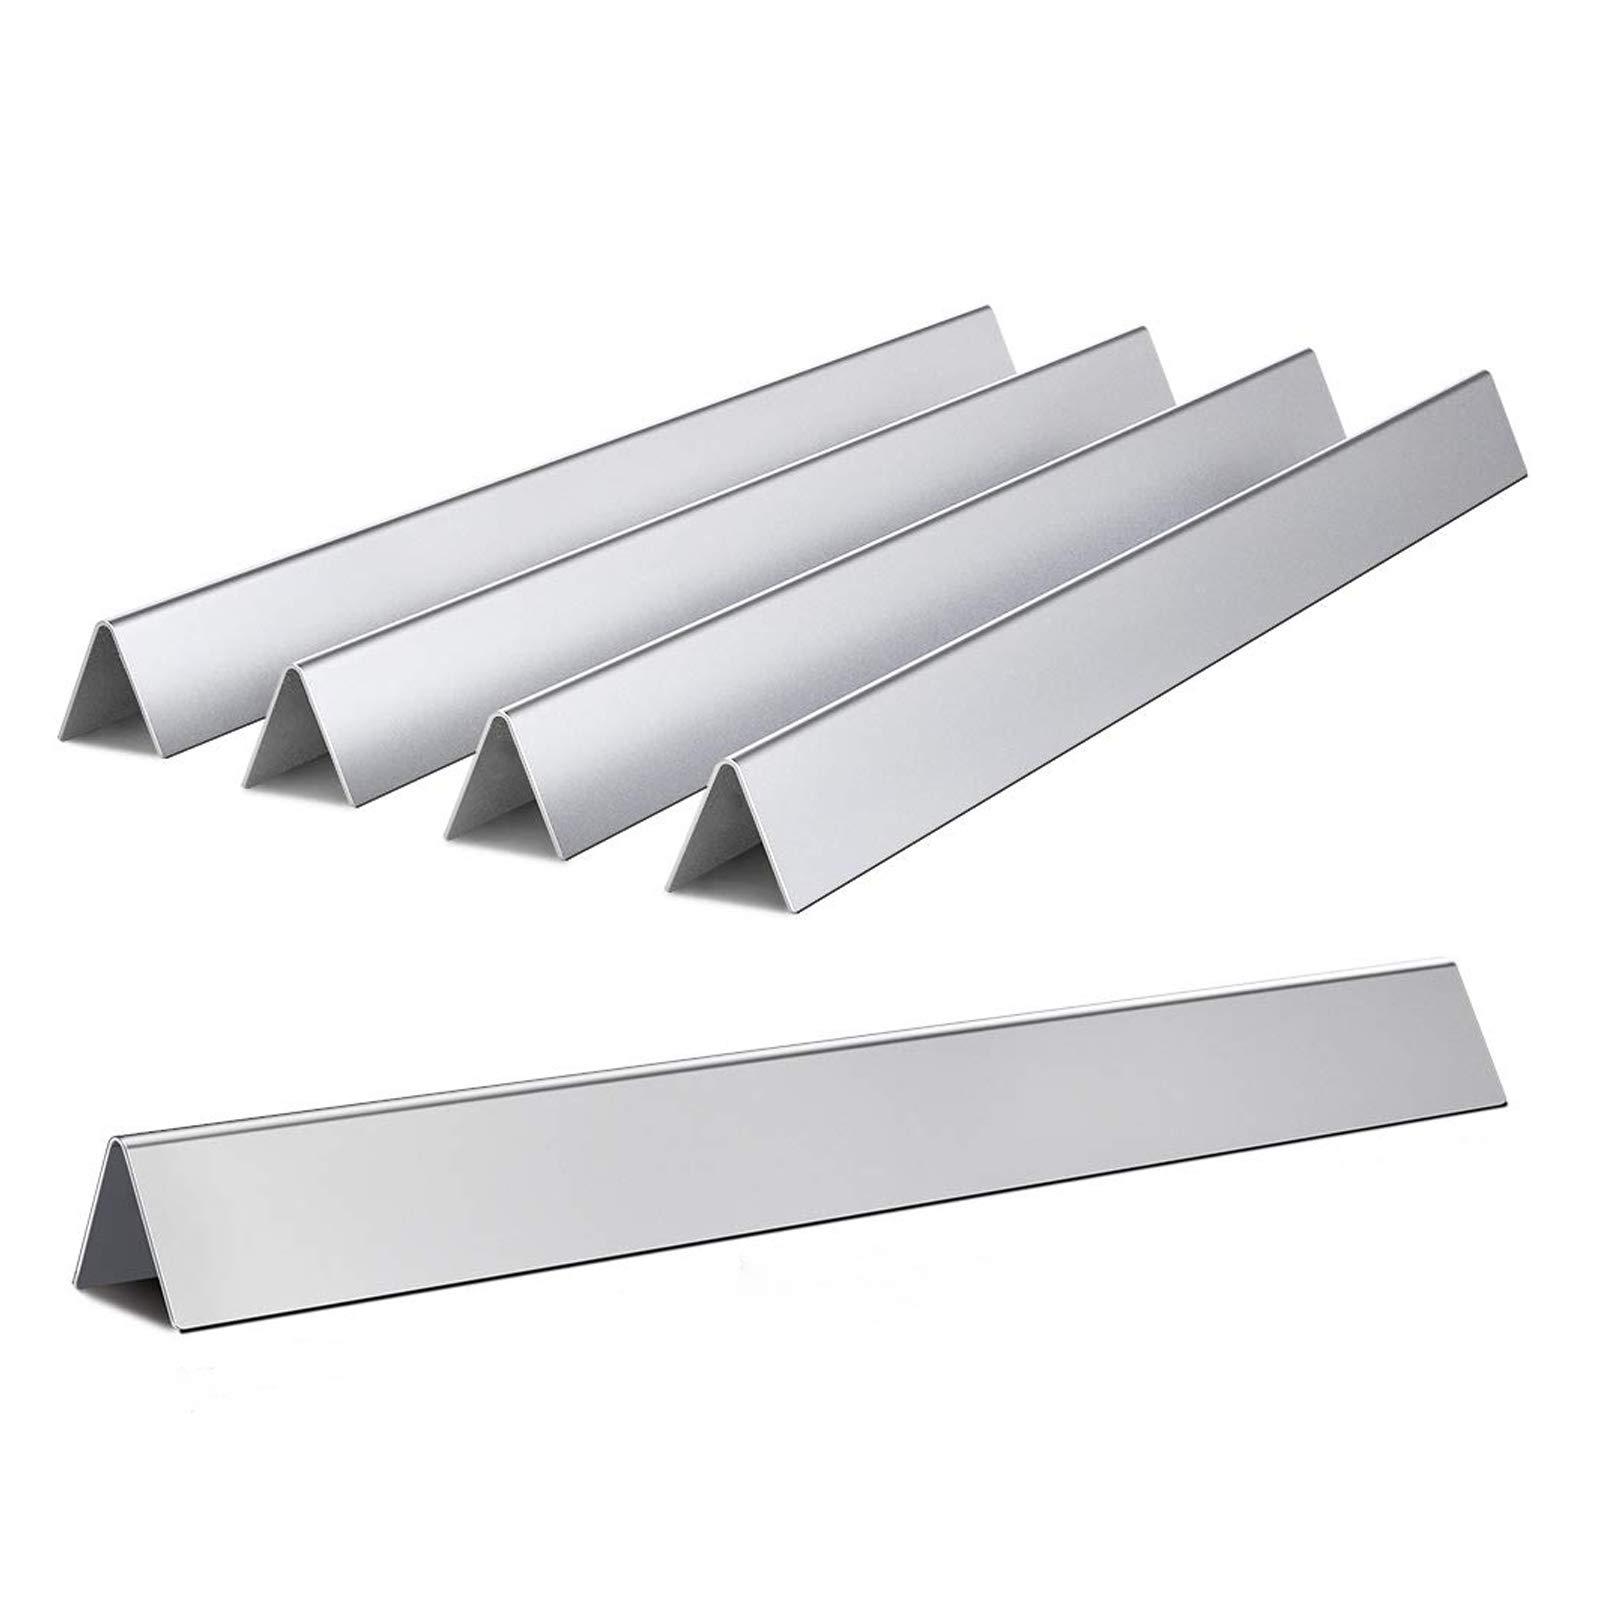 SHINESTAR 7536 22.5 inch Flavorizer Bars for Weber Spirit 300, E310, E320, Genesis Silver B/C, Genesis Gold Series Gas Grills, Stainless Steel Flavor Bars for Weber 7537, 65903, 5 Pack